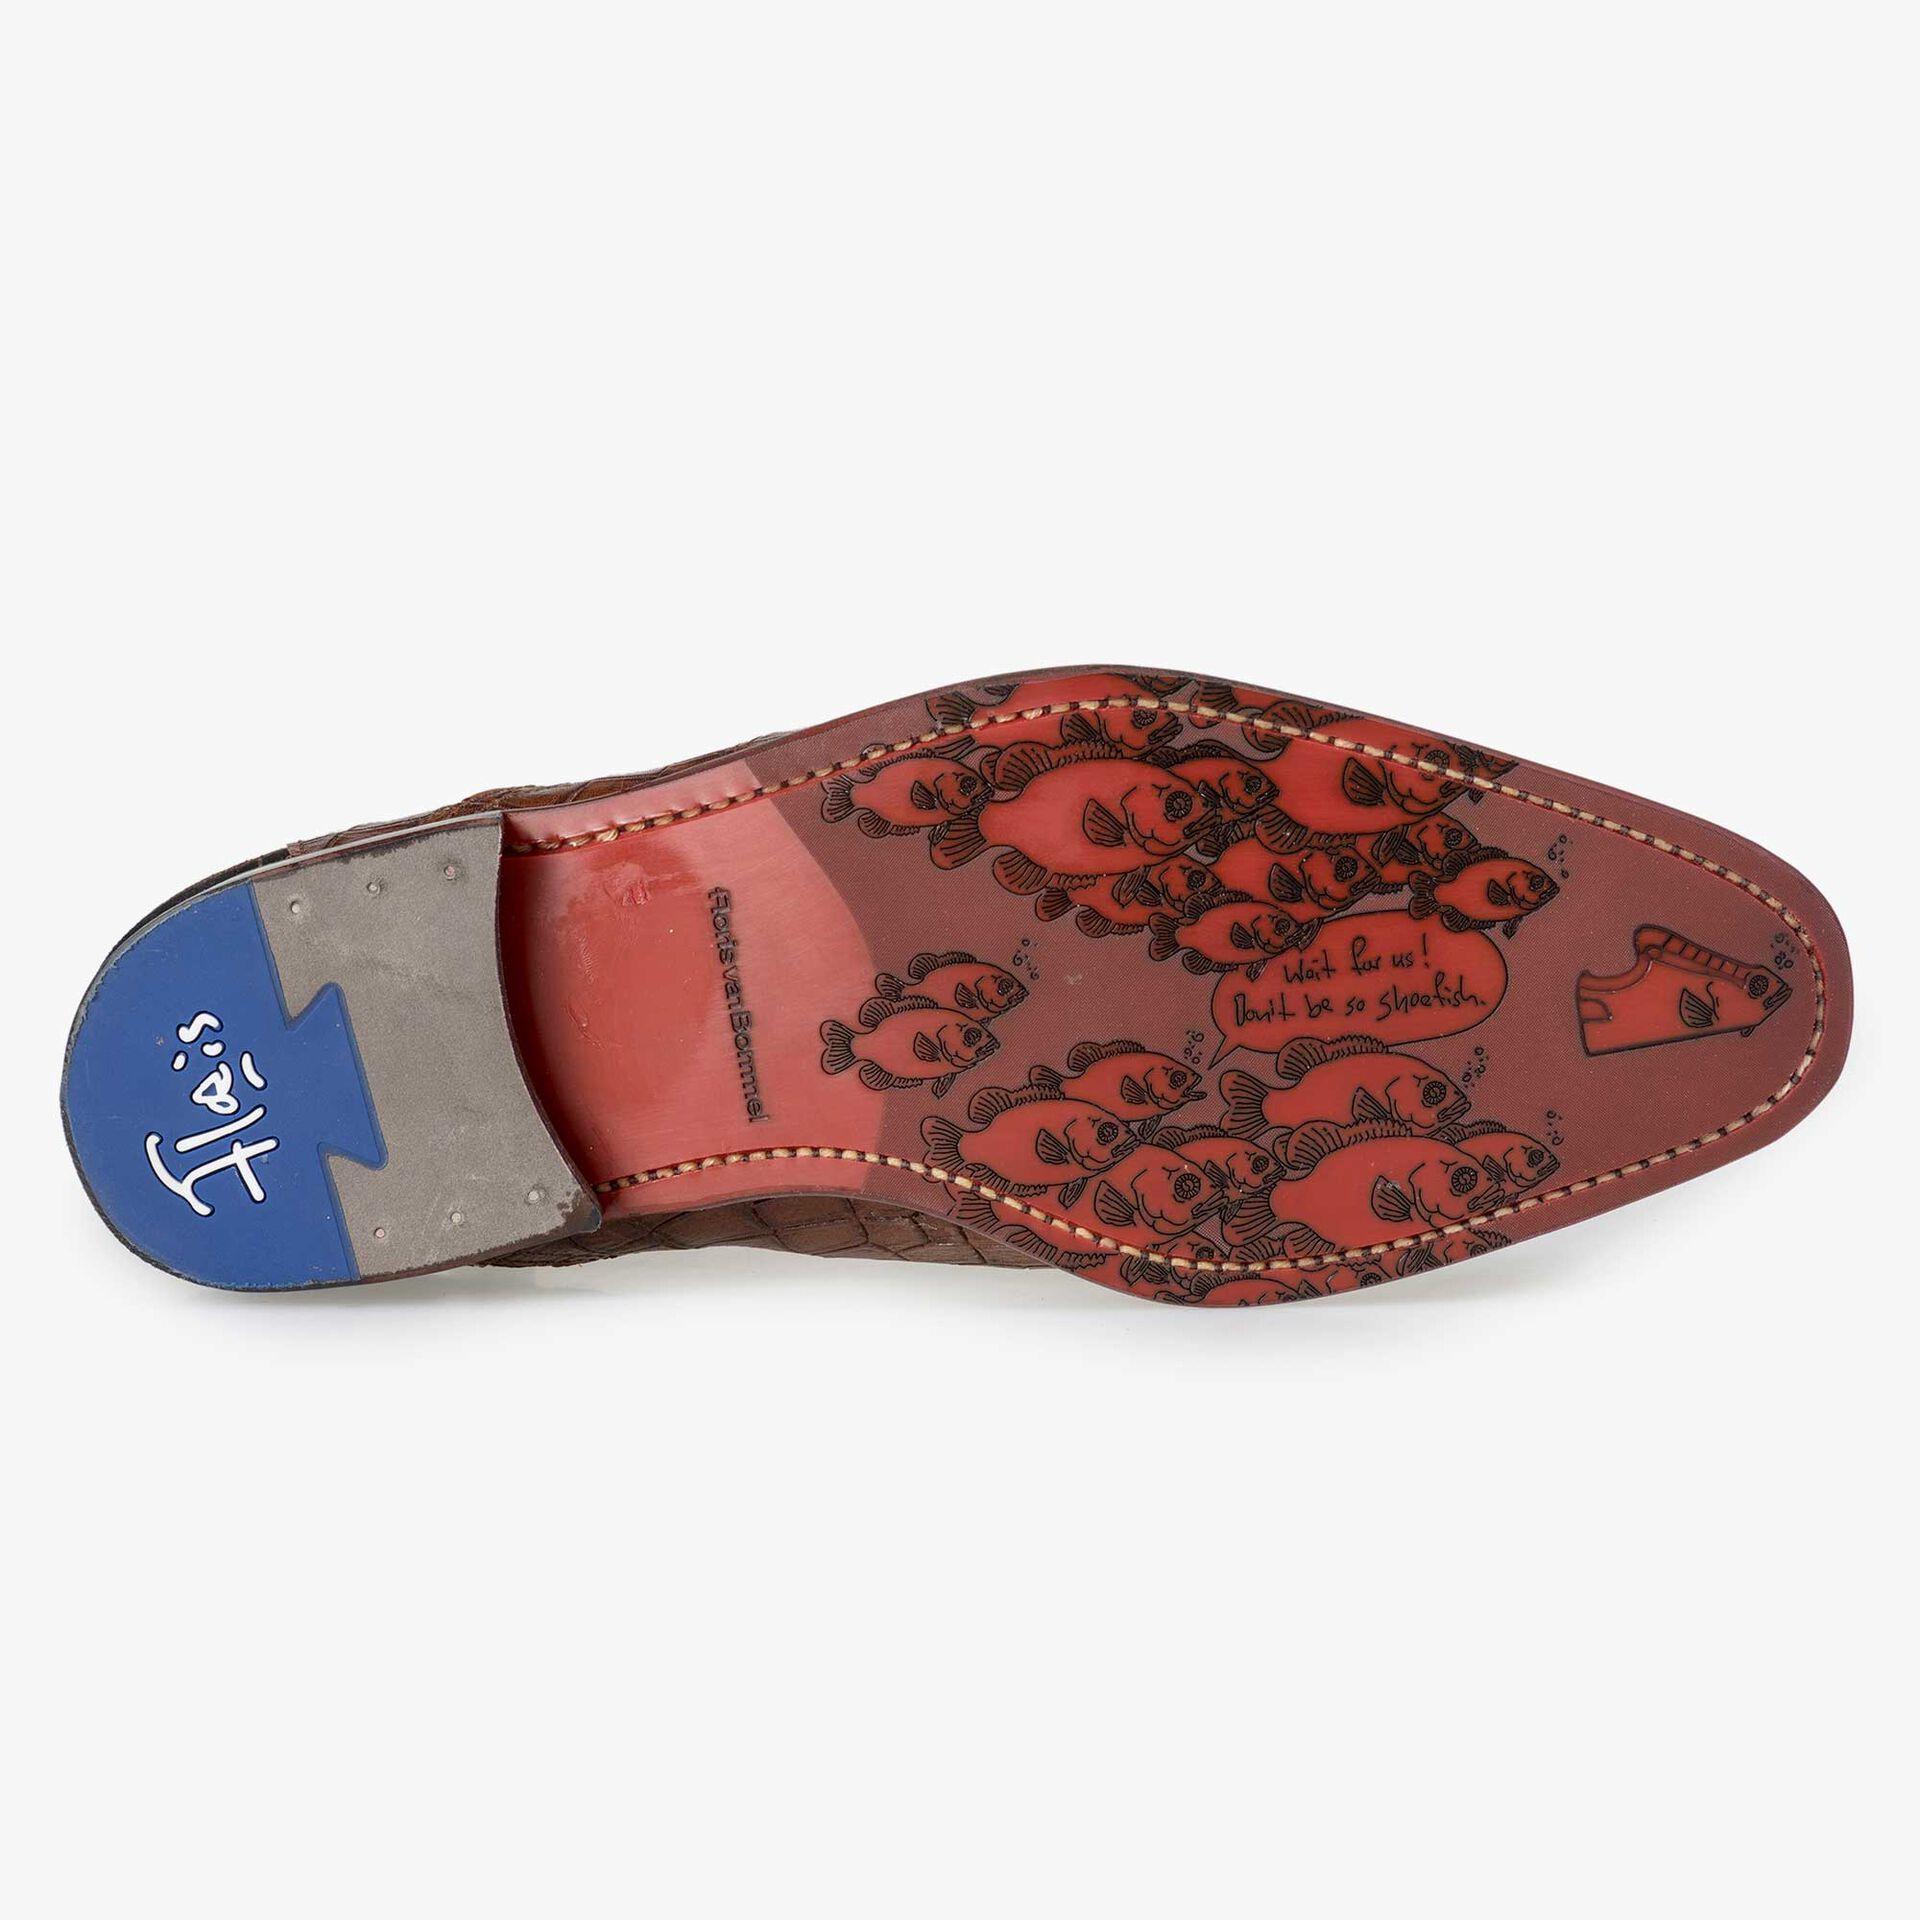 Floris van Bommel men's brown Chelsea boot finished with a crocodile print